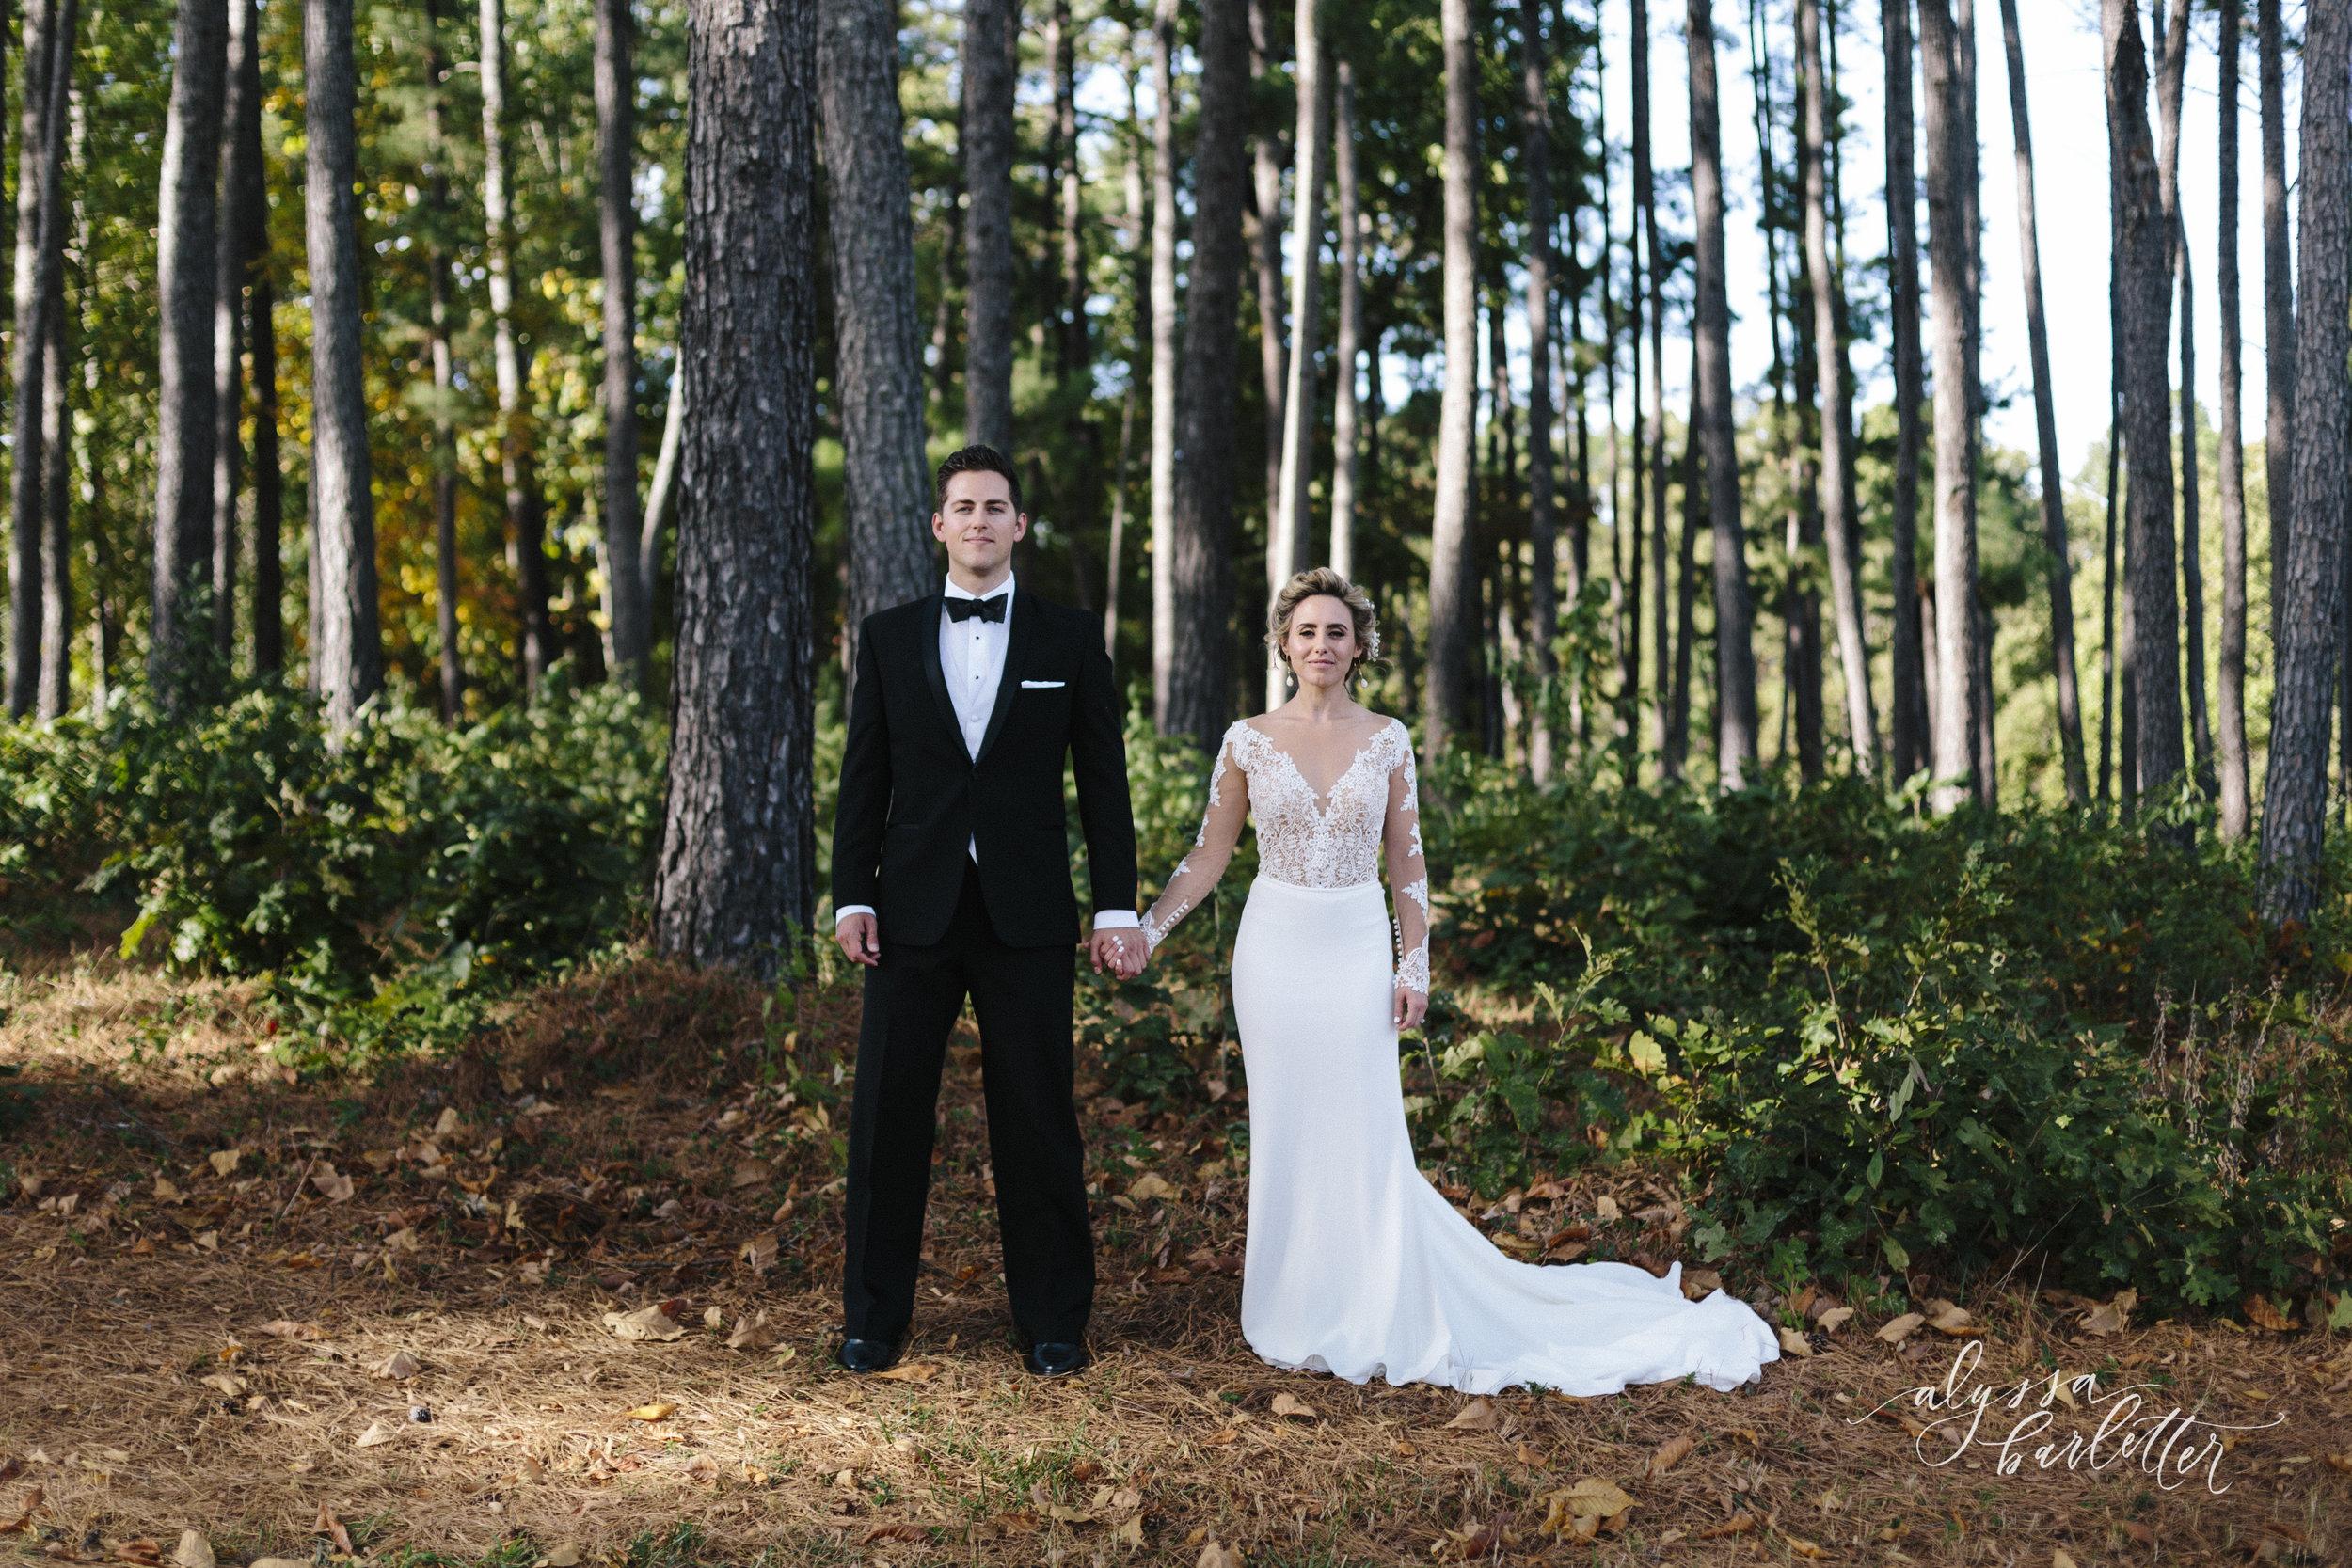 alyssa barletter photography fayetteville arkansas wedding photos micah and colin-1-31.jpg